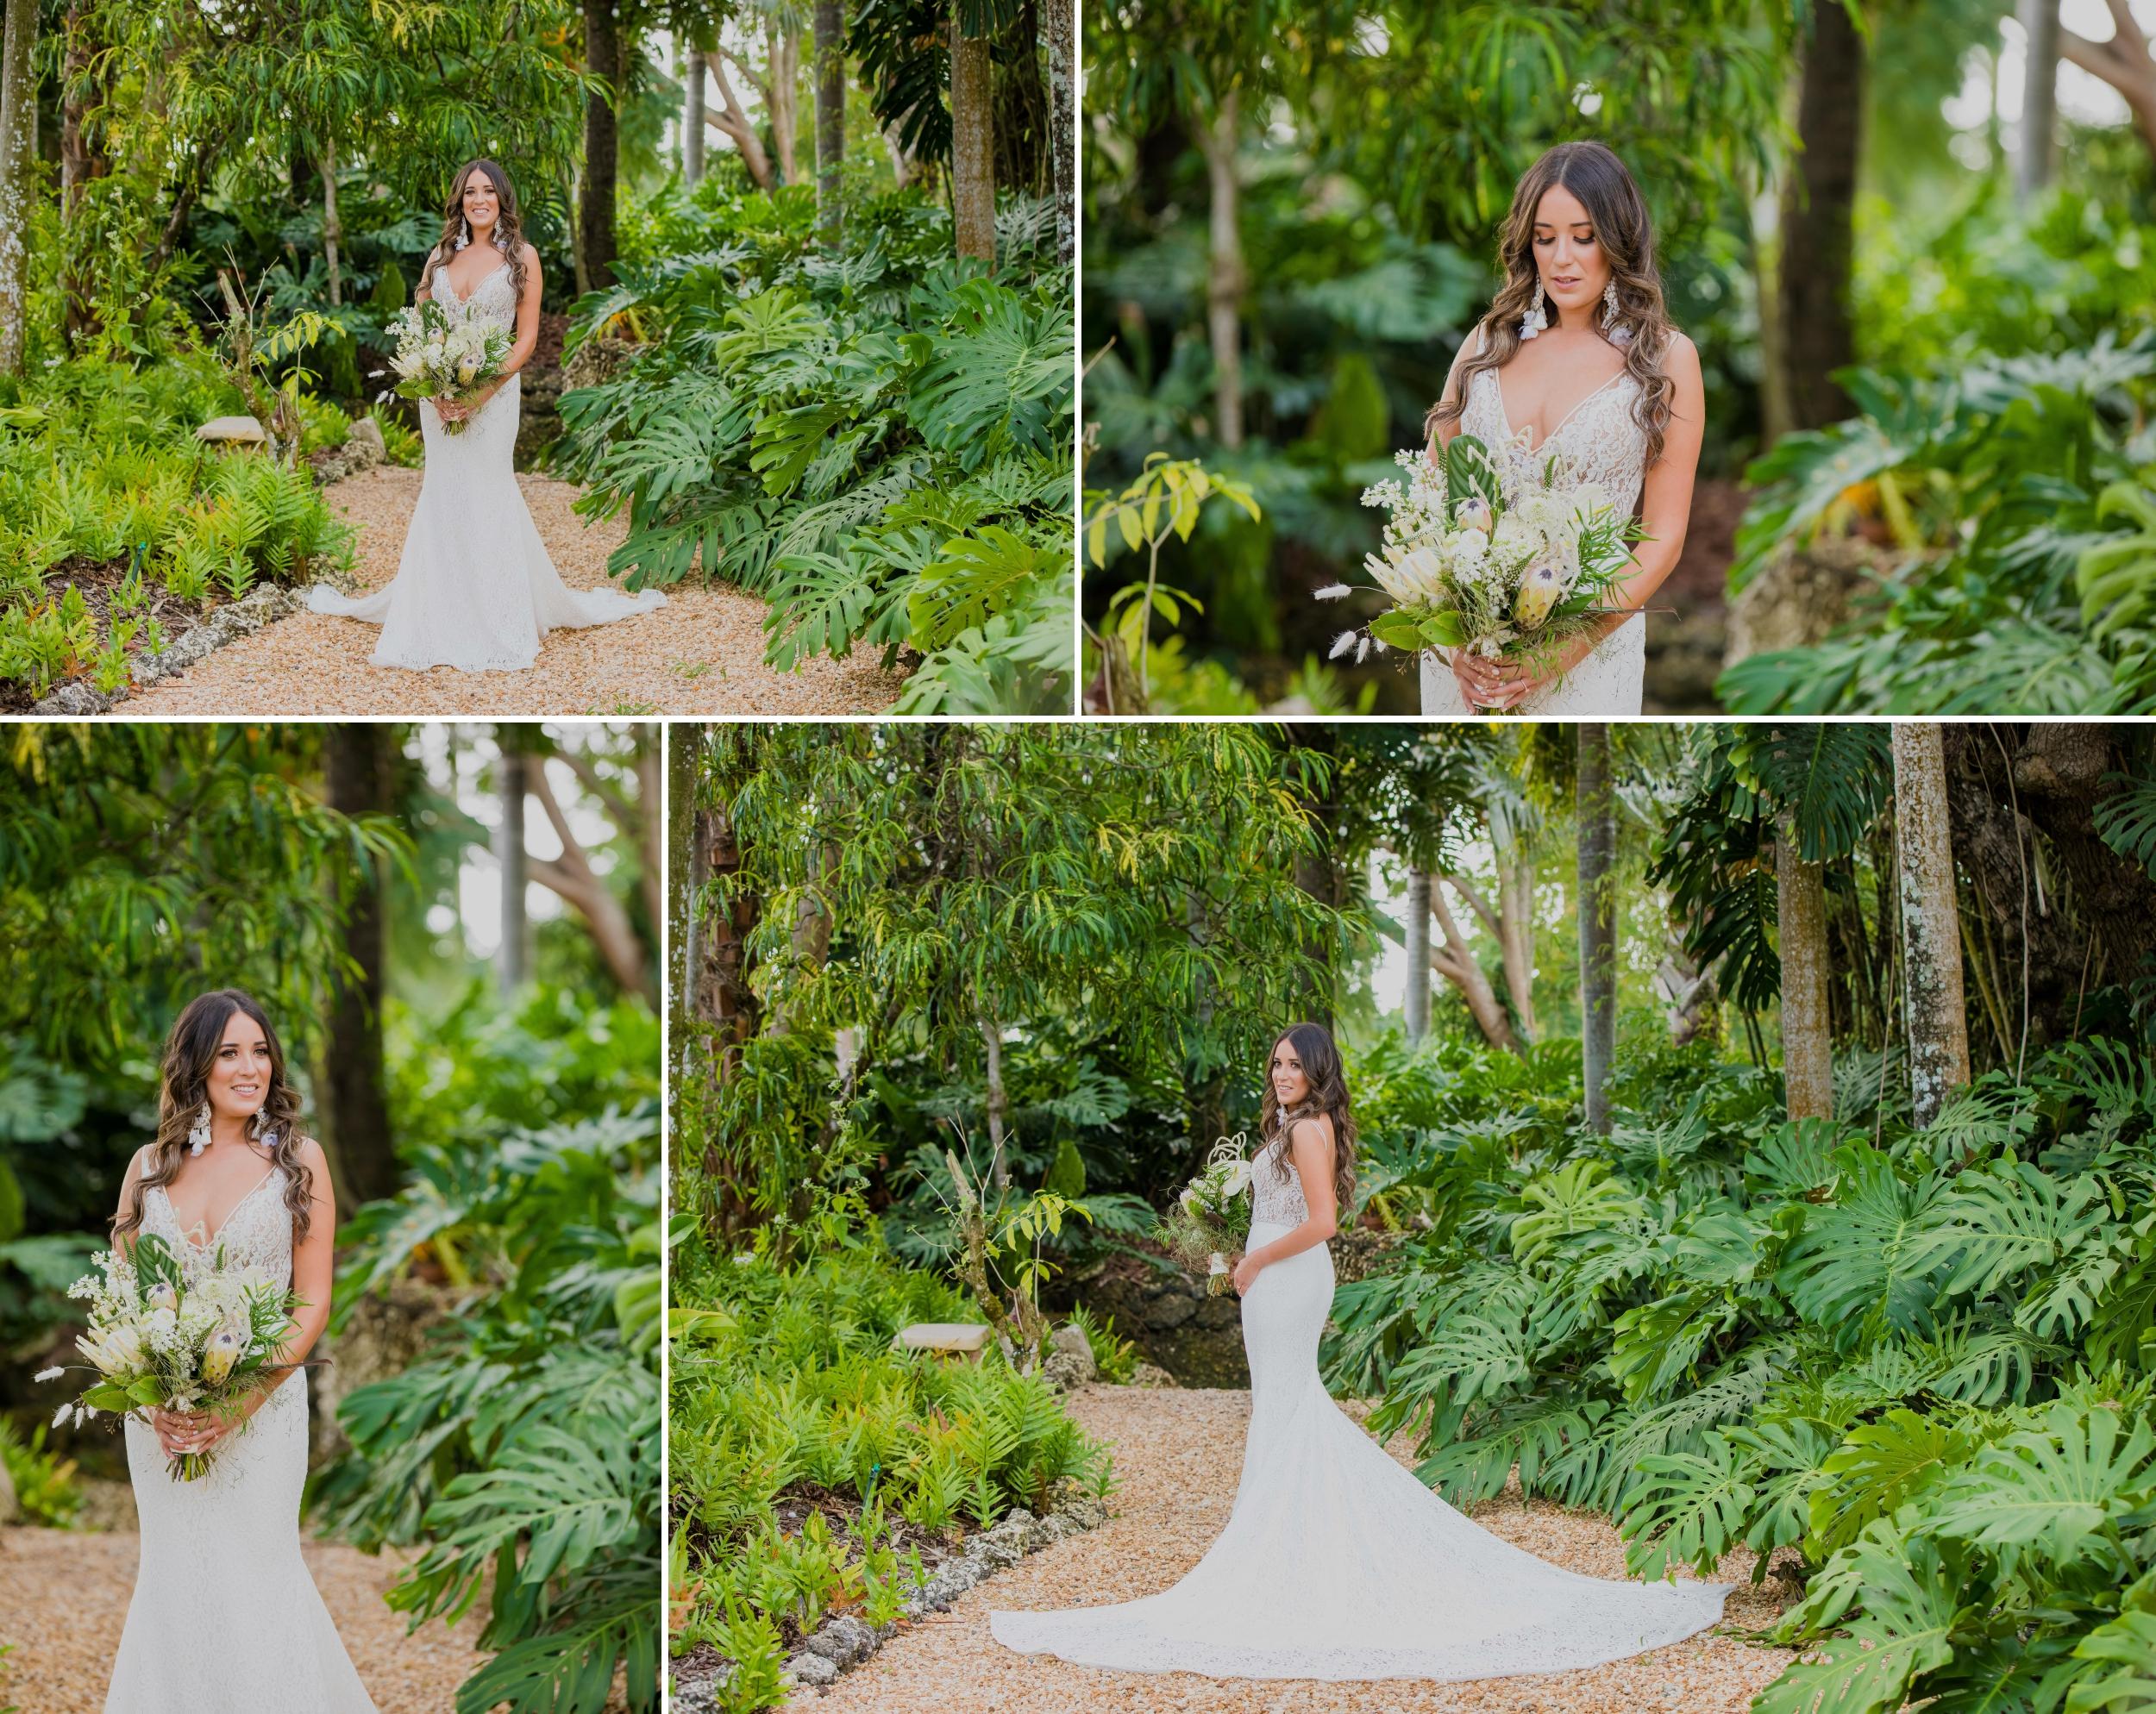 Wedding Whimsical Key West House  - Photography by Santy Martinez 4.jpg